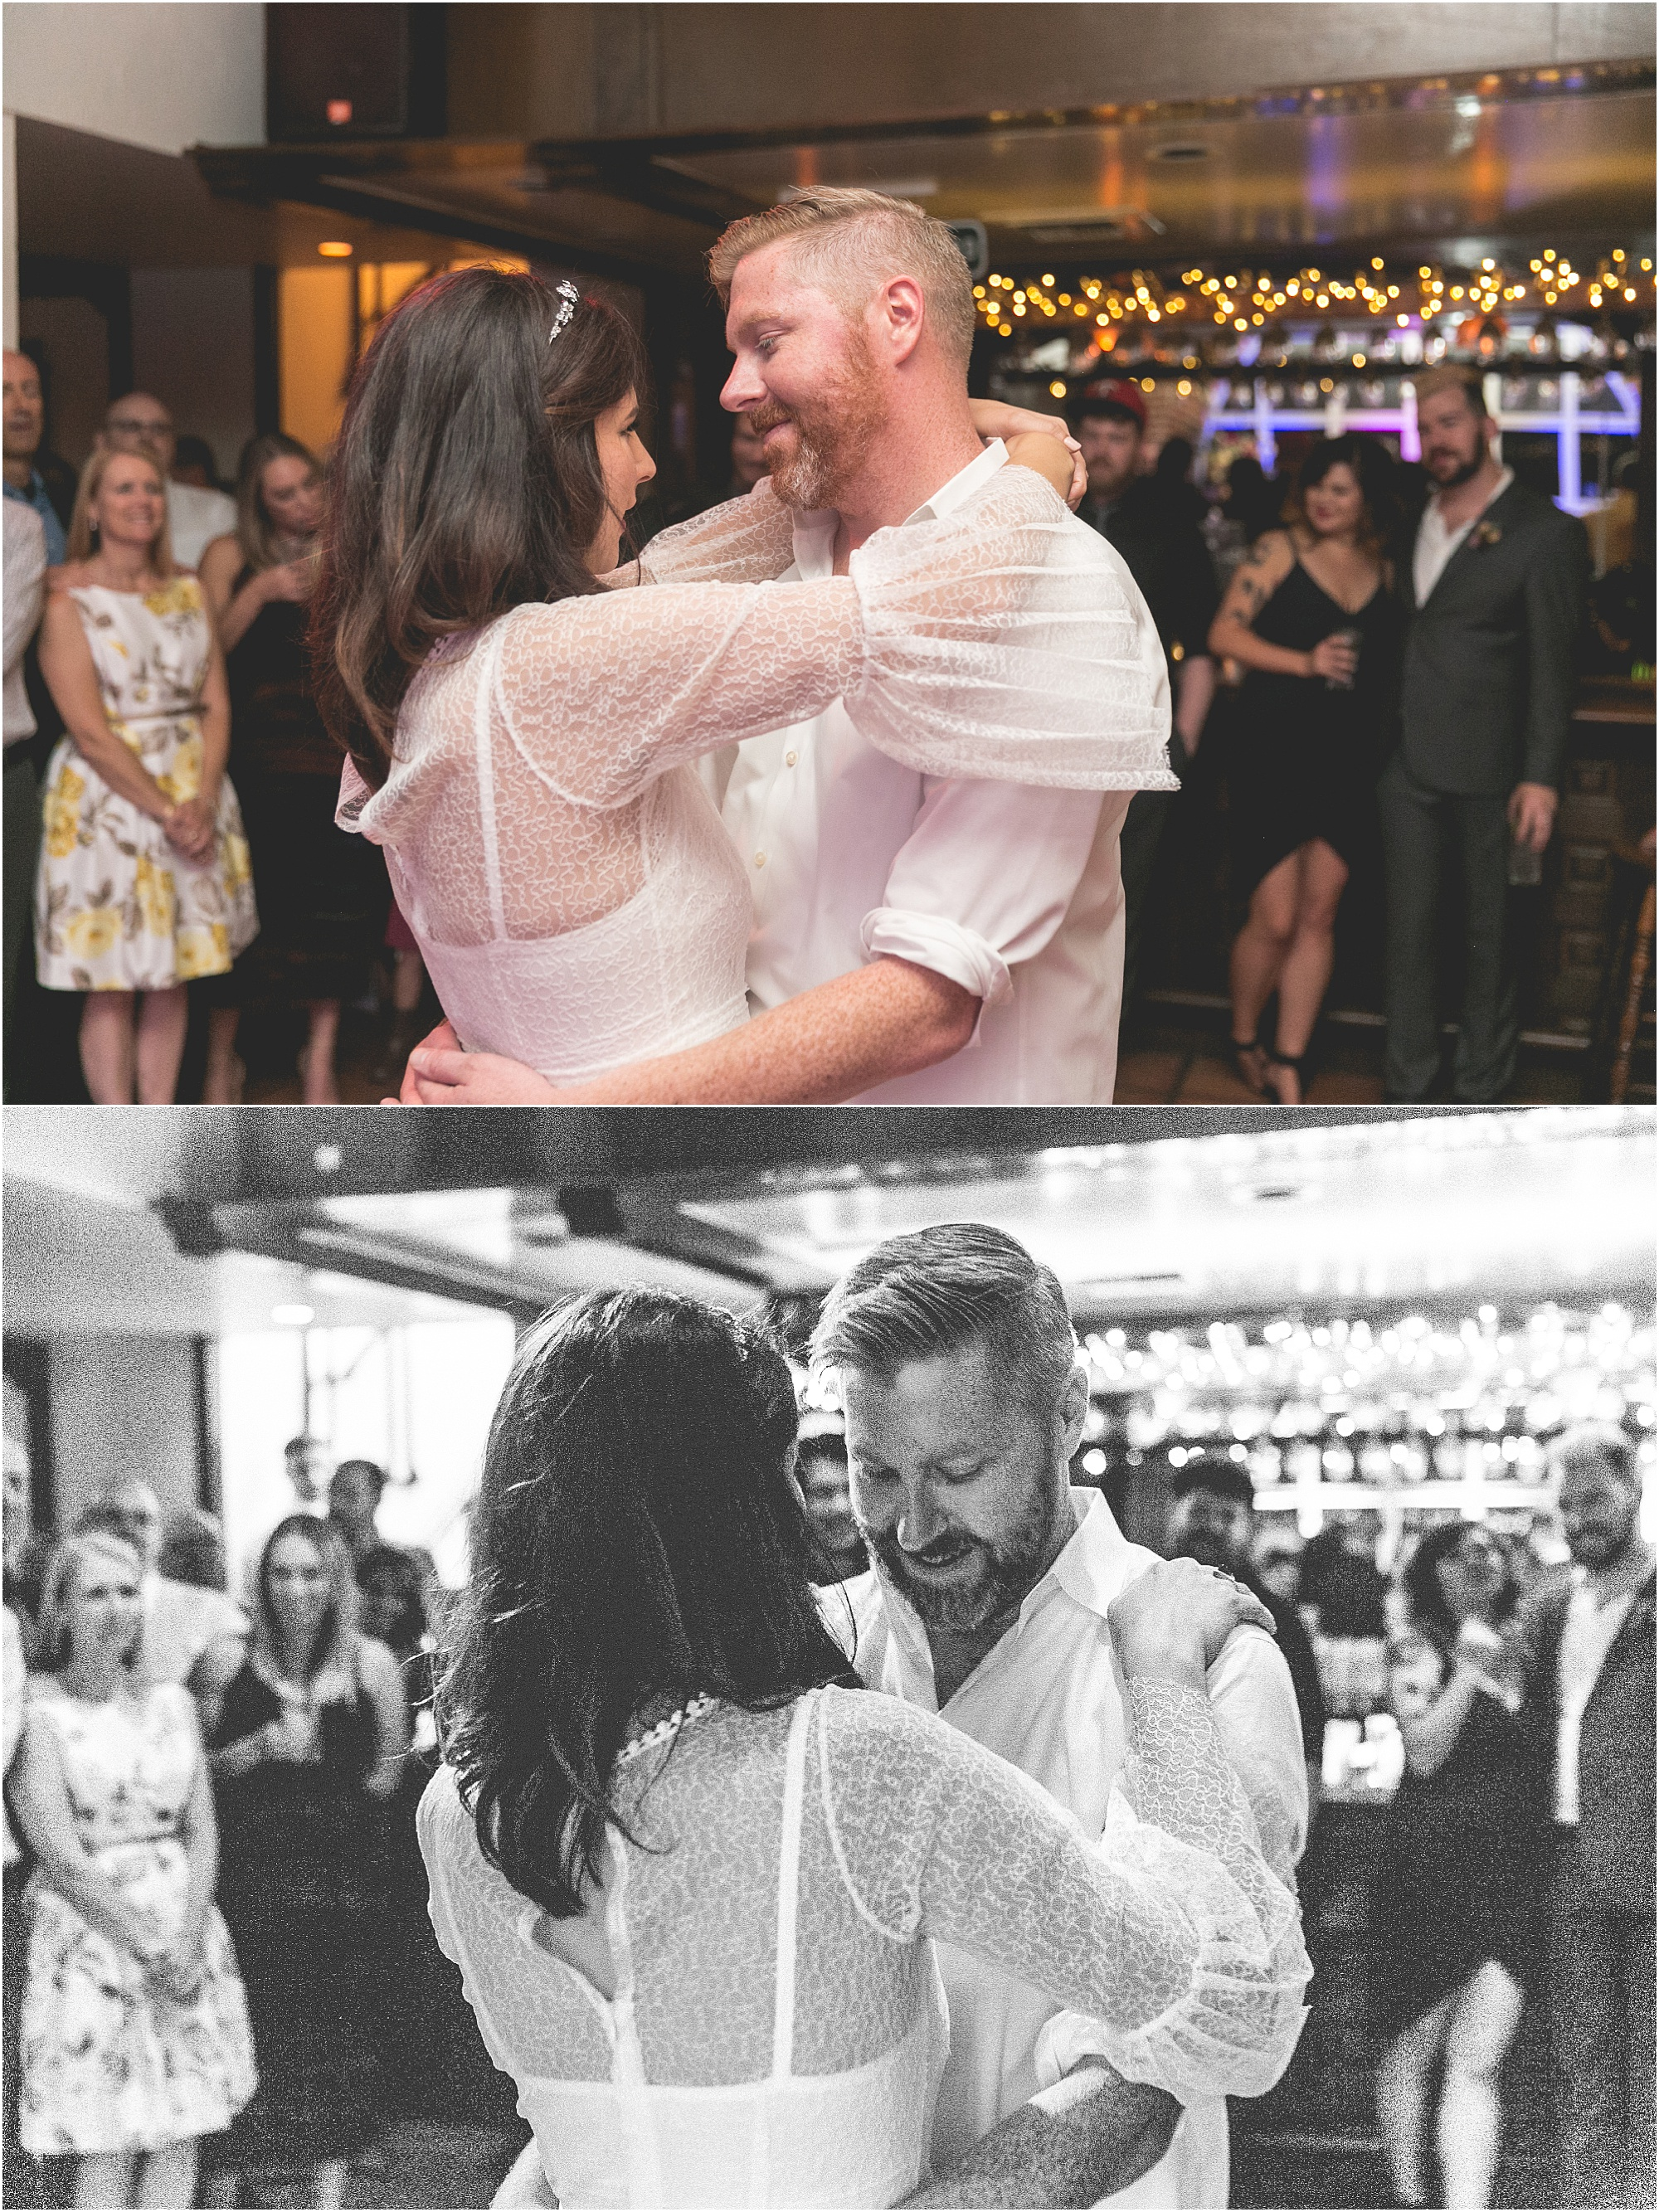 Haley Wedding Stomps 34 LAST ONE.jpg